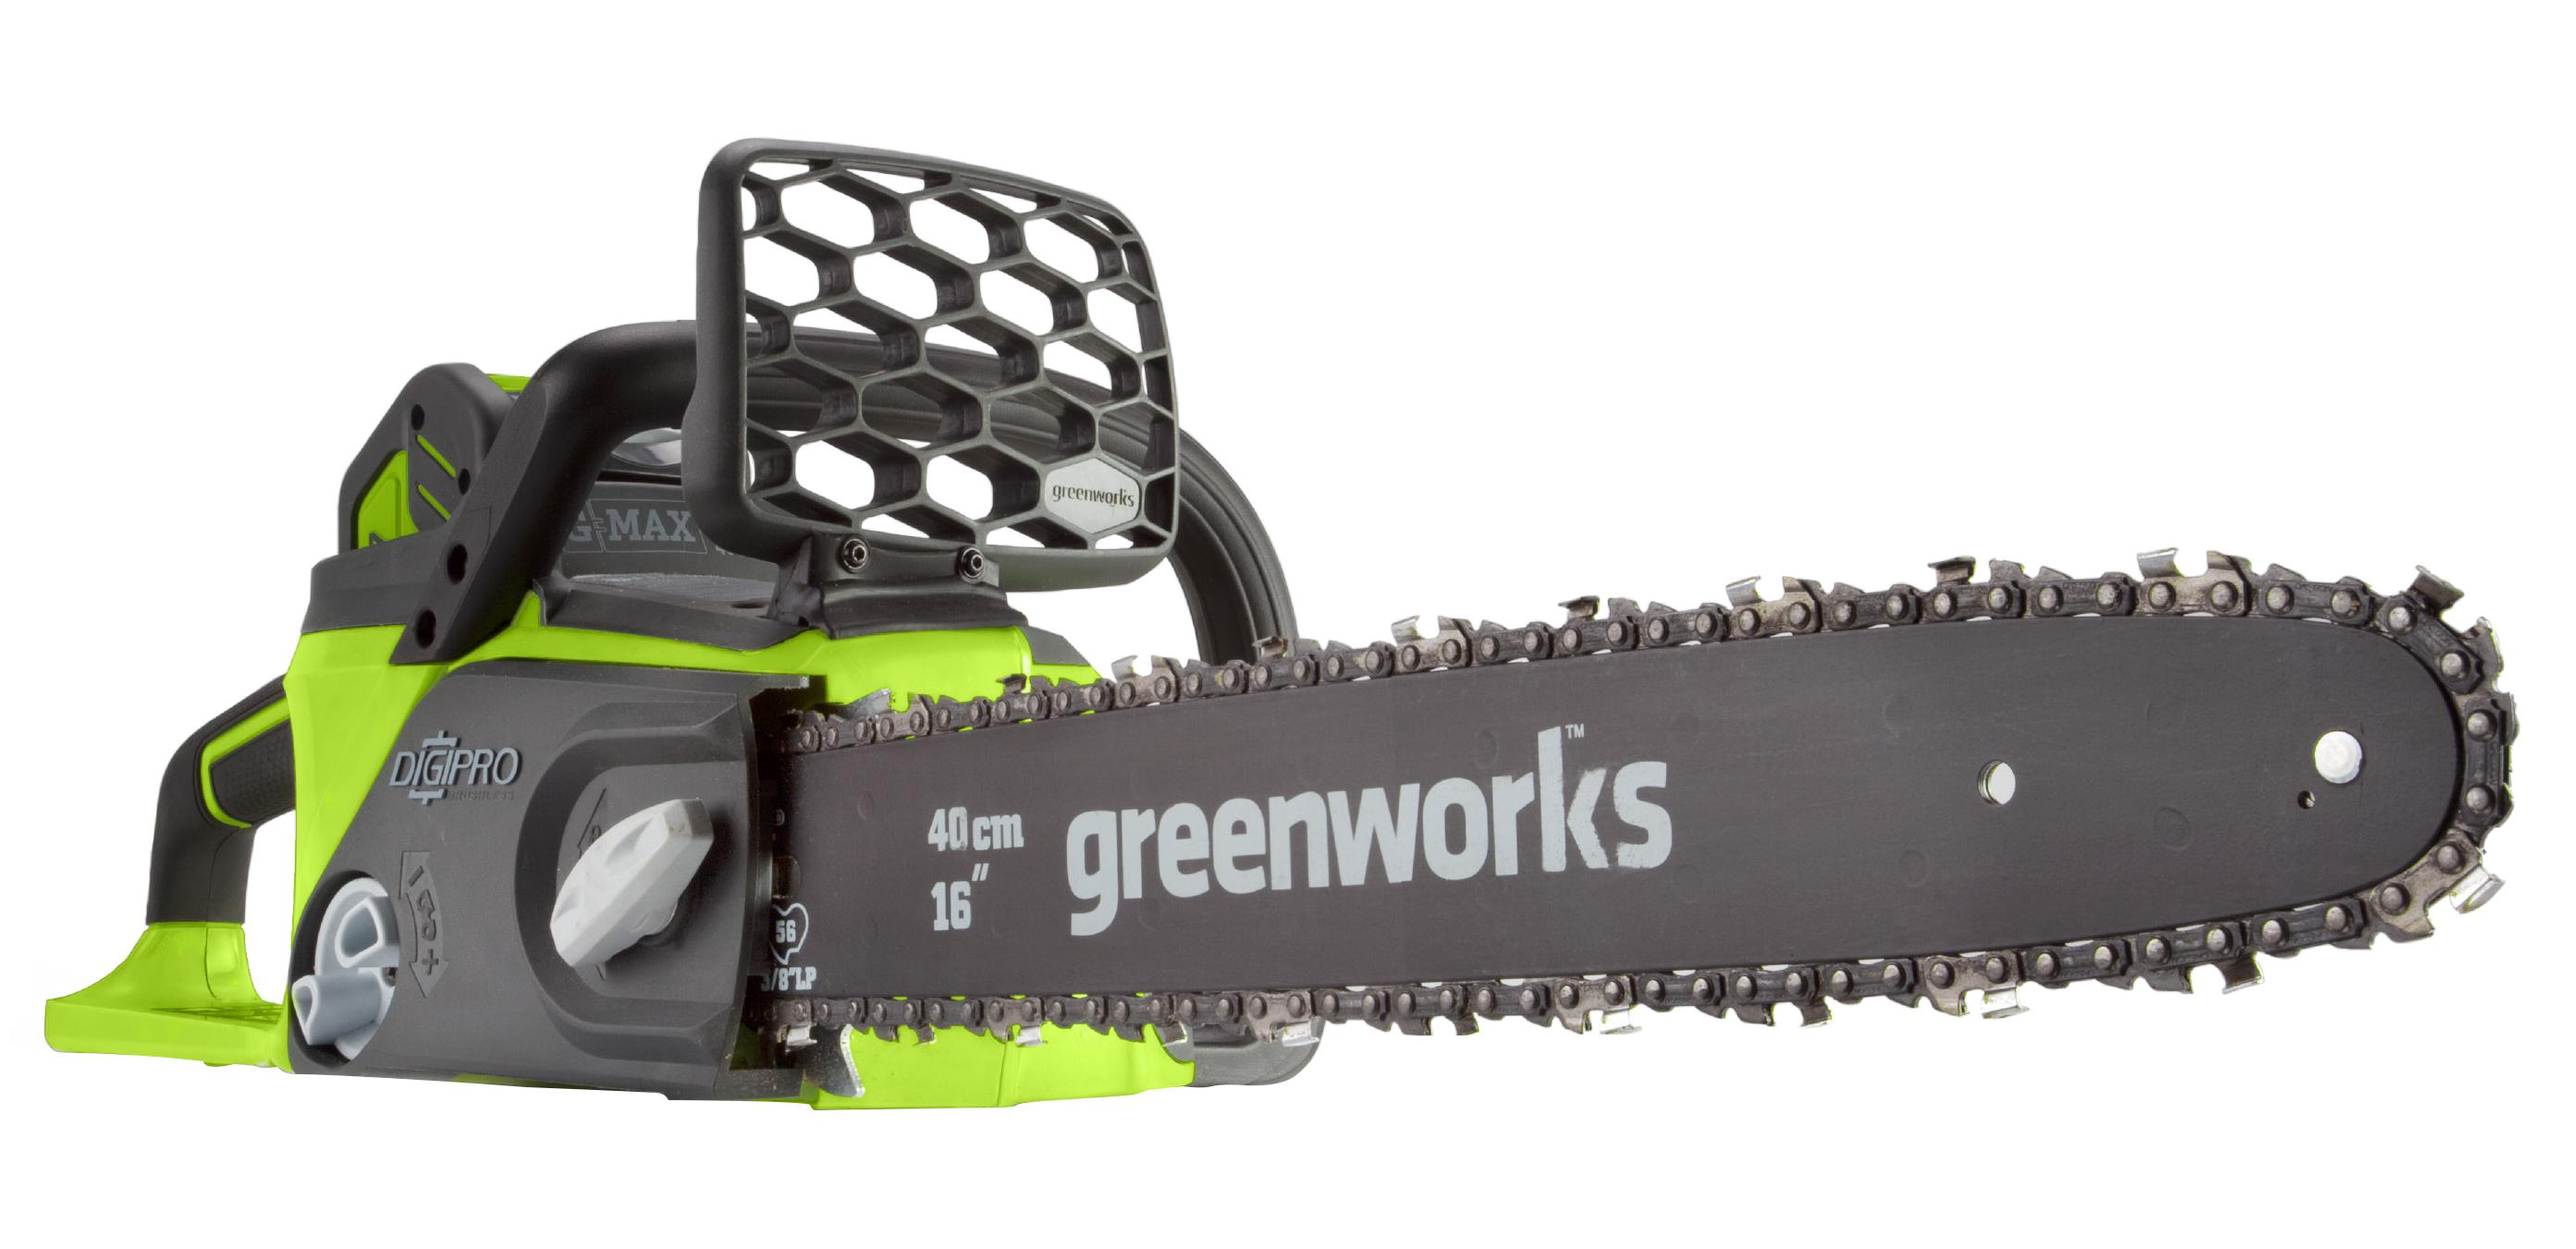 Пила цепная аккумуляторная Greenworks Gd40cs40k4 (20077ub) 1акк 40В 4Ач + ЗУ